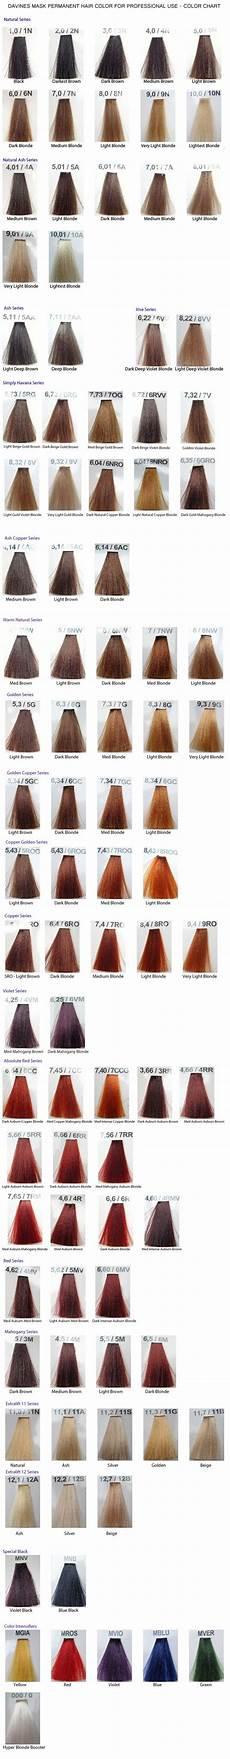 Davines Mask Colour Chart Davines Mask Color Chart Hair Color Chart Hair Color